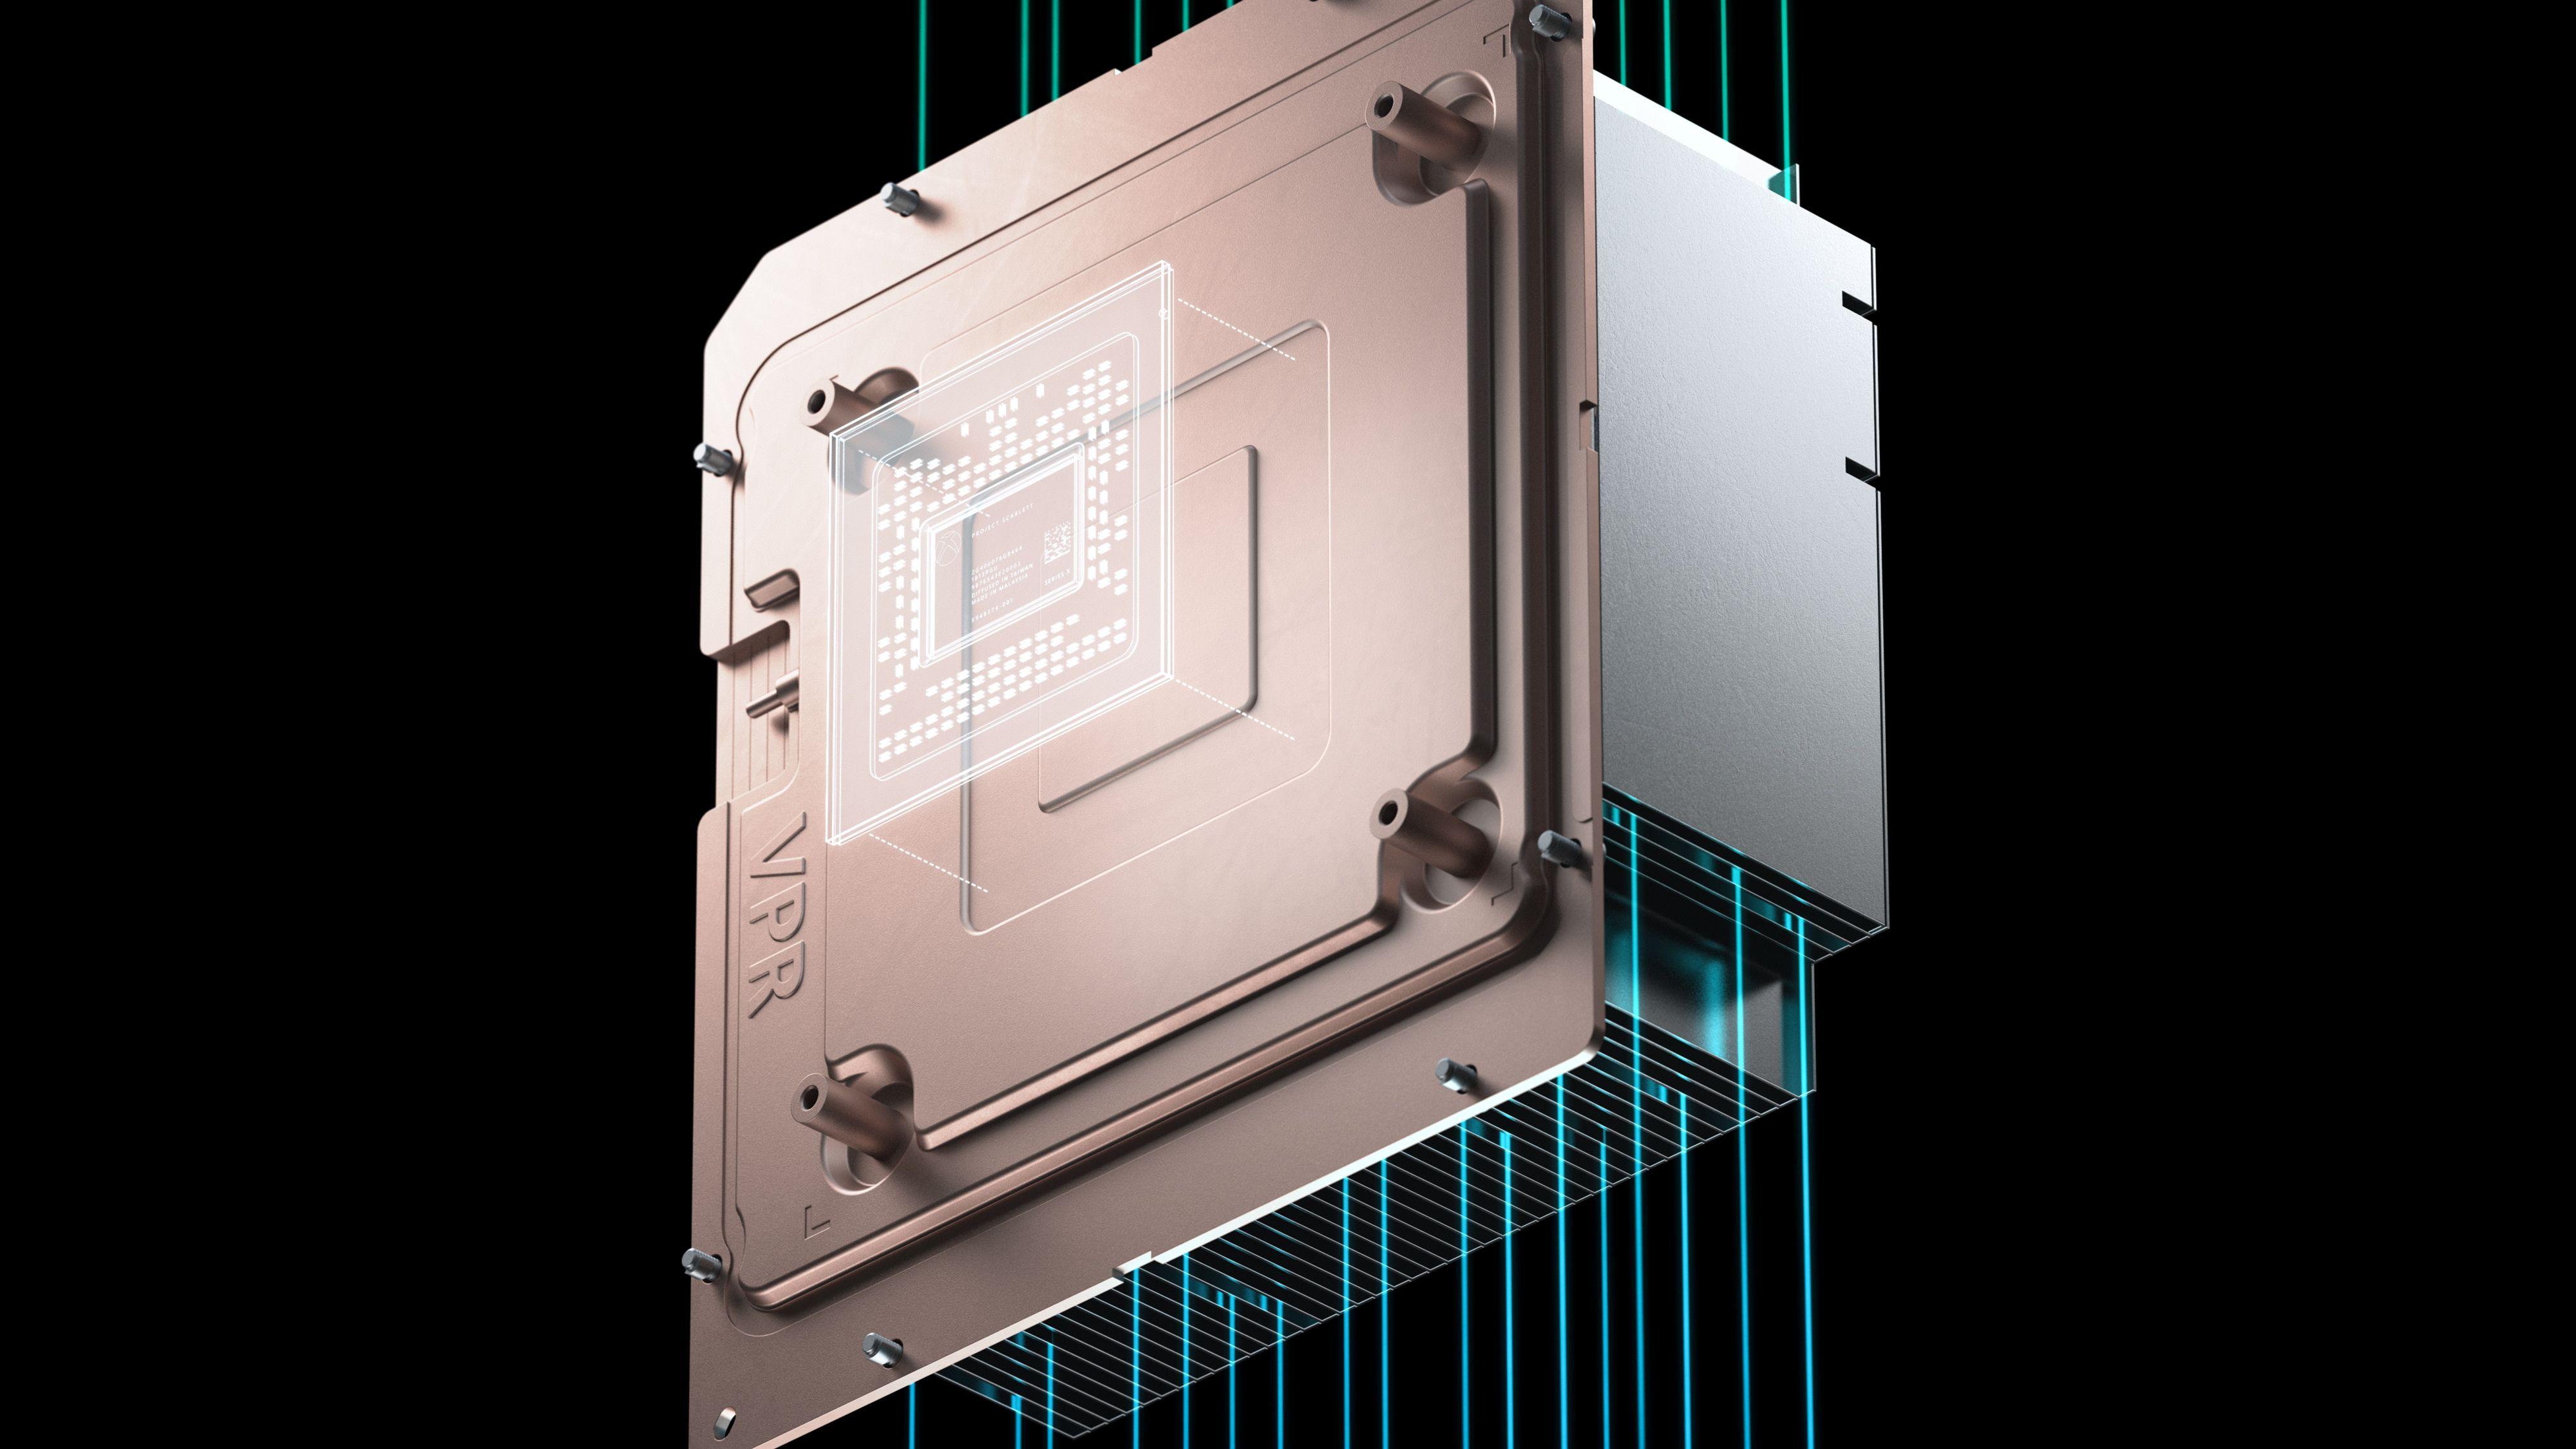 Fordampingskammeret sørger for bedre og jevnere kjøling i Xbox Series X.